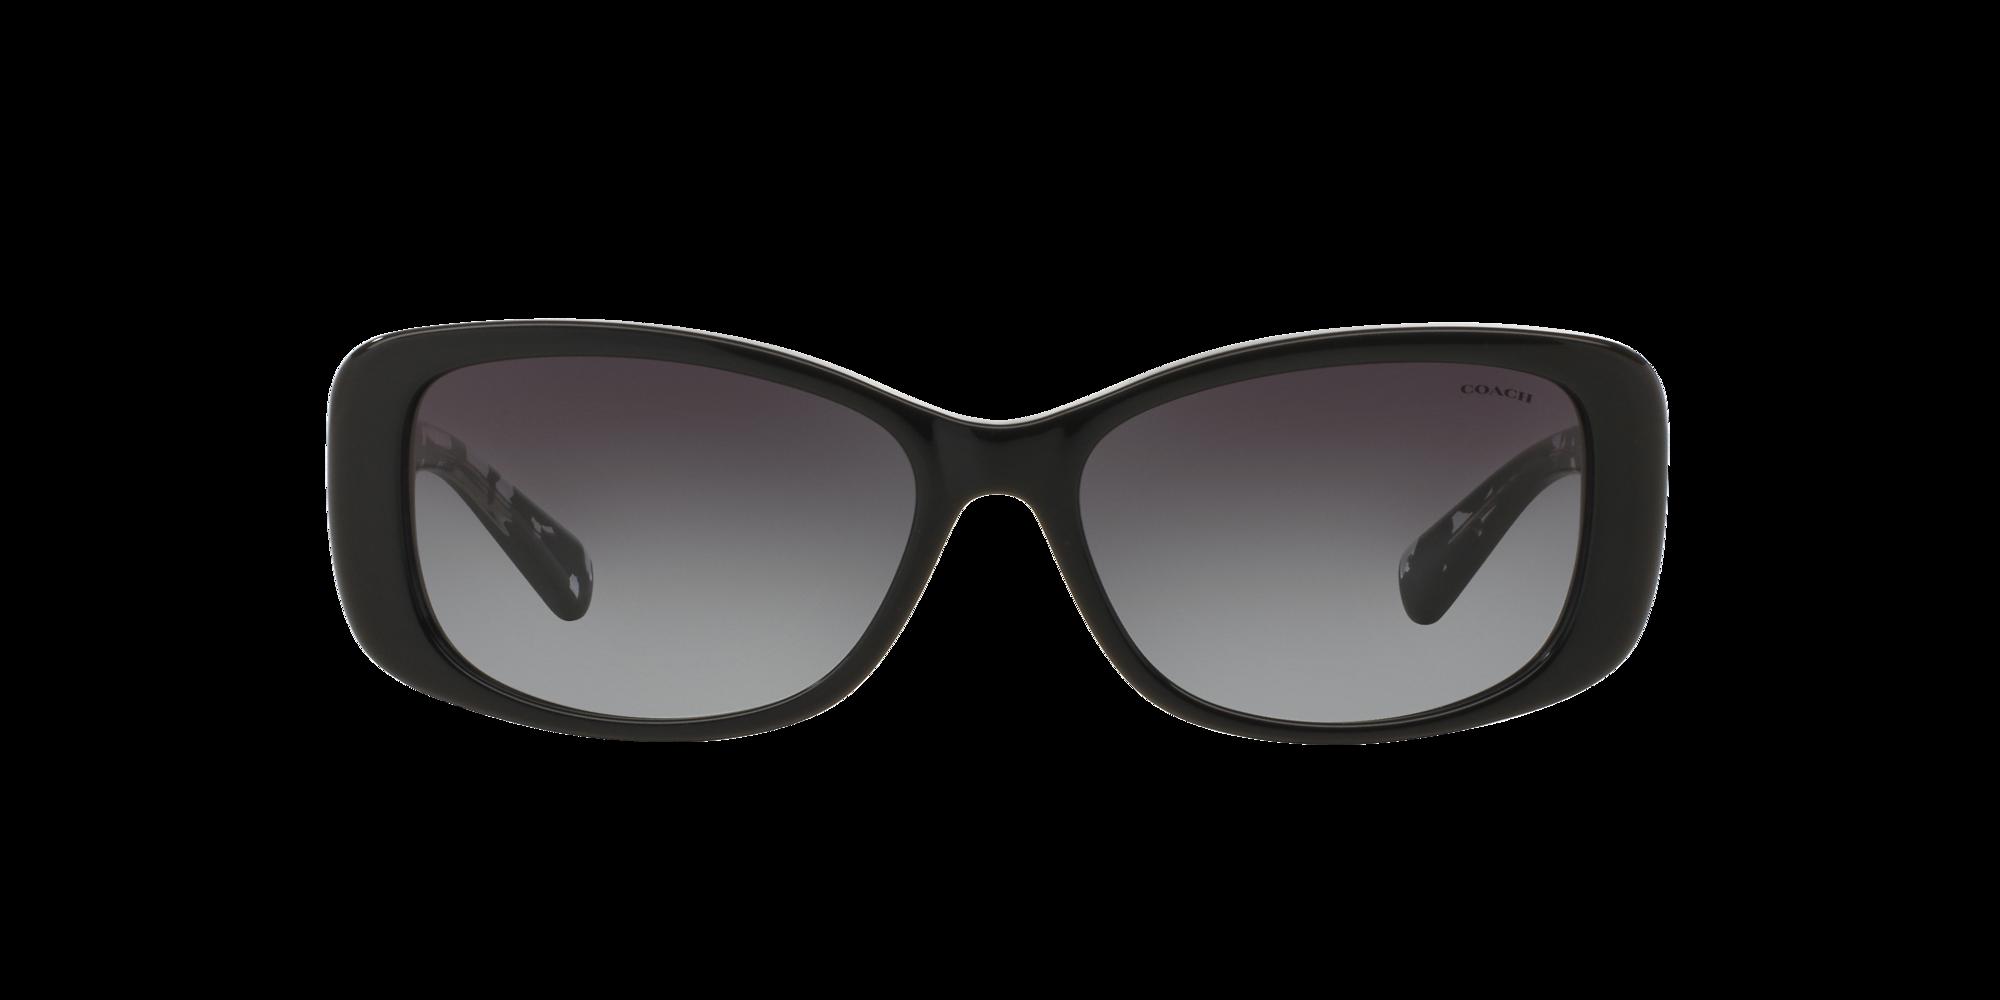 Image for HC8168 56 L156 from LensCrafters | Glasses, Prescription Glasses Online, Eyewear